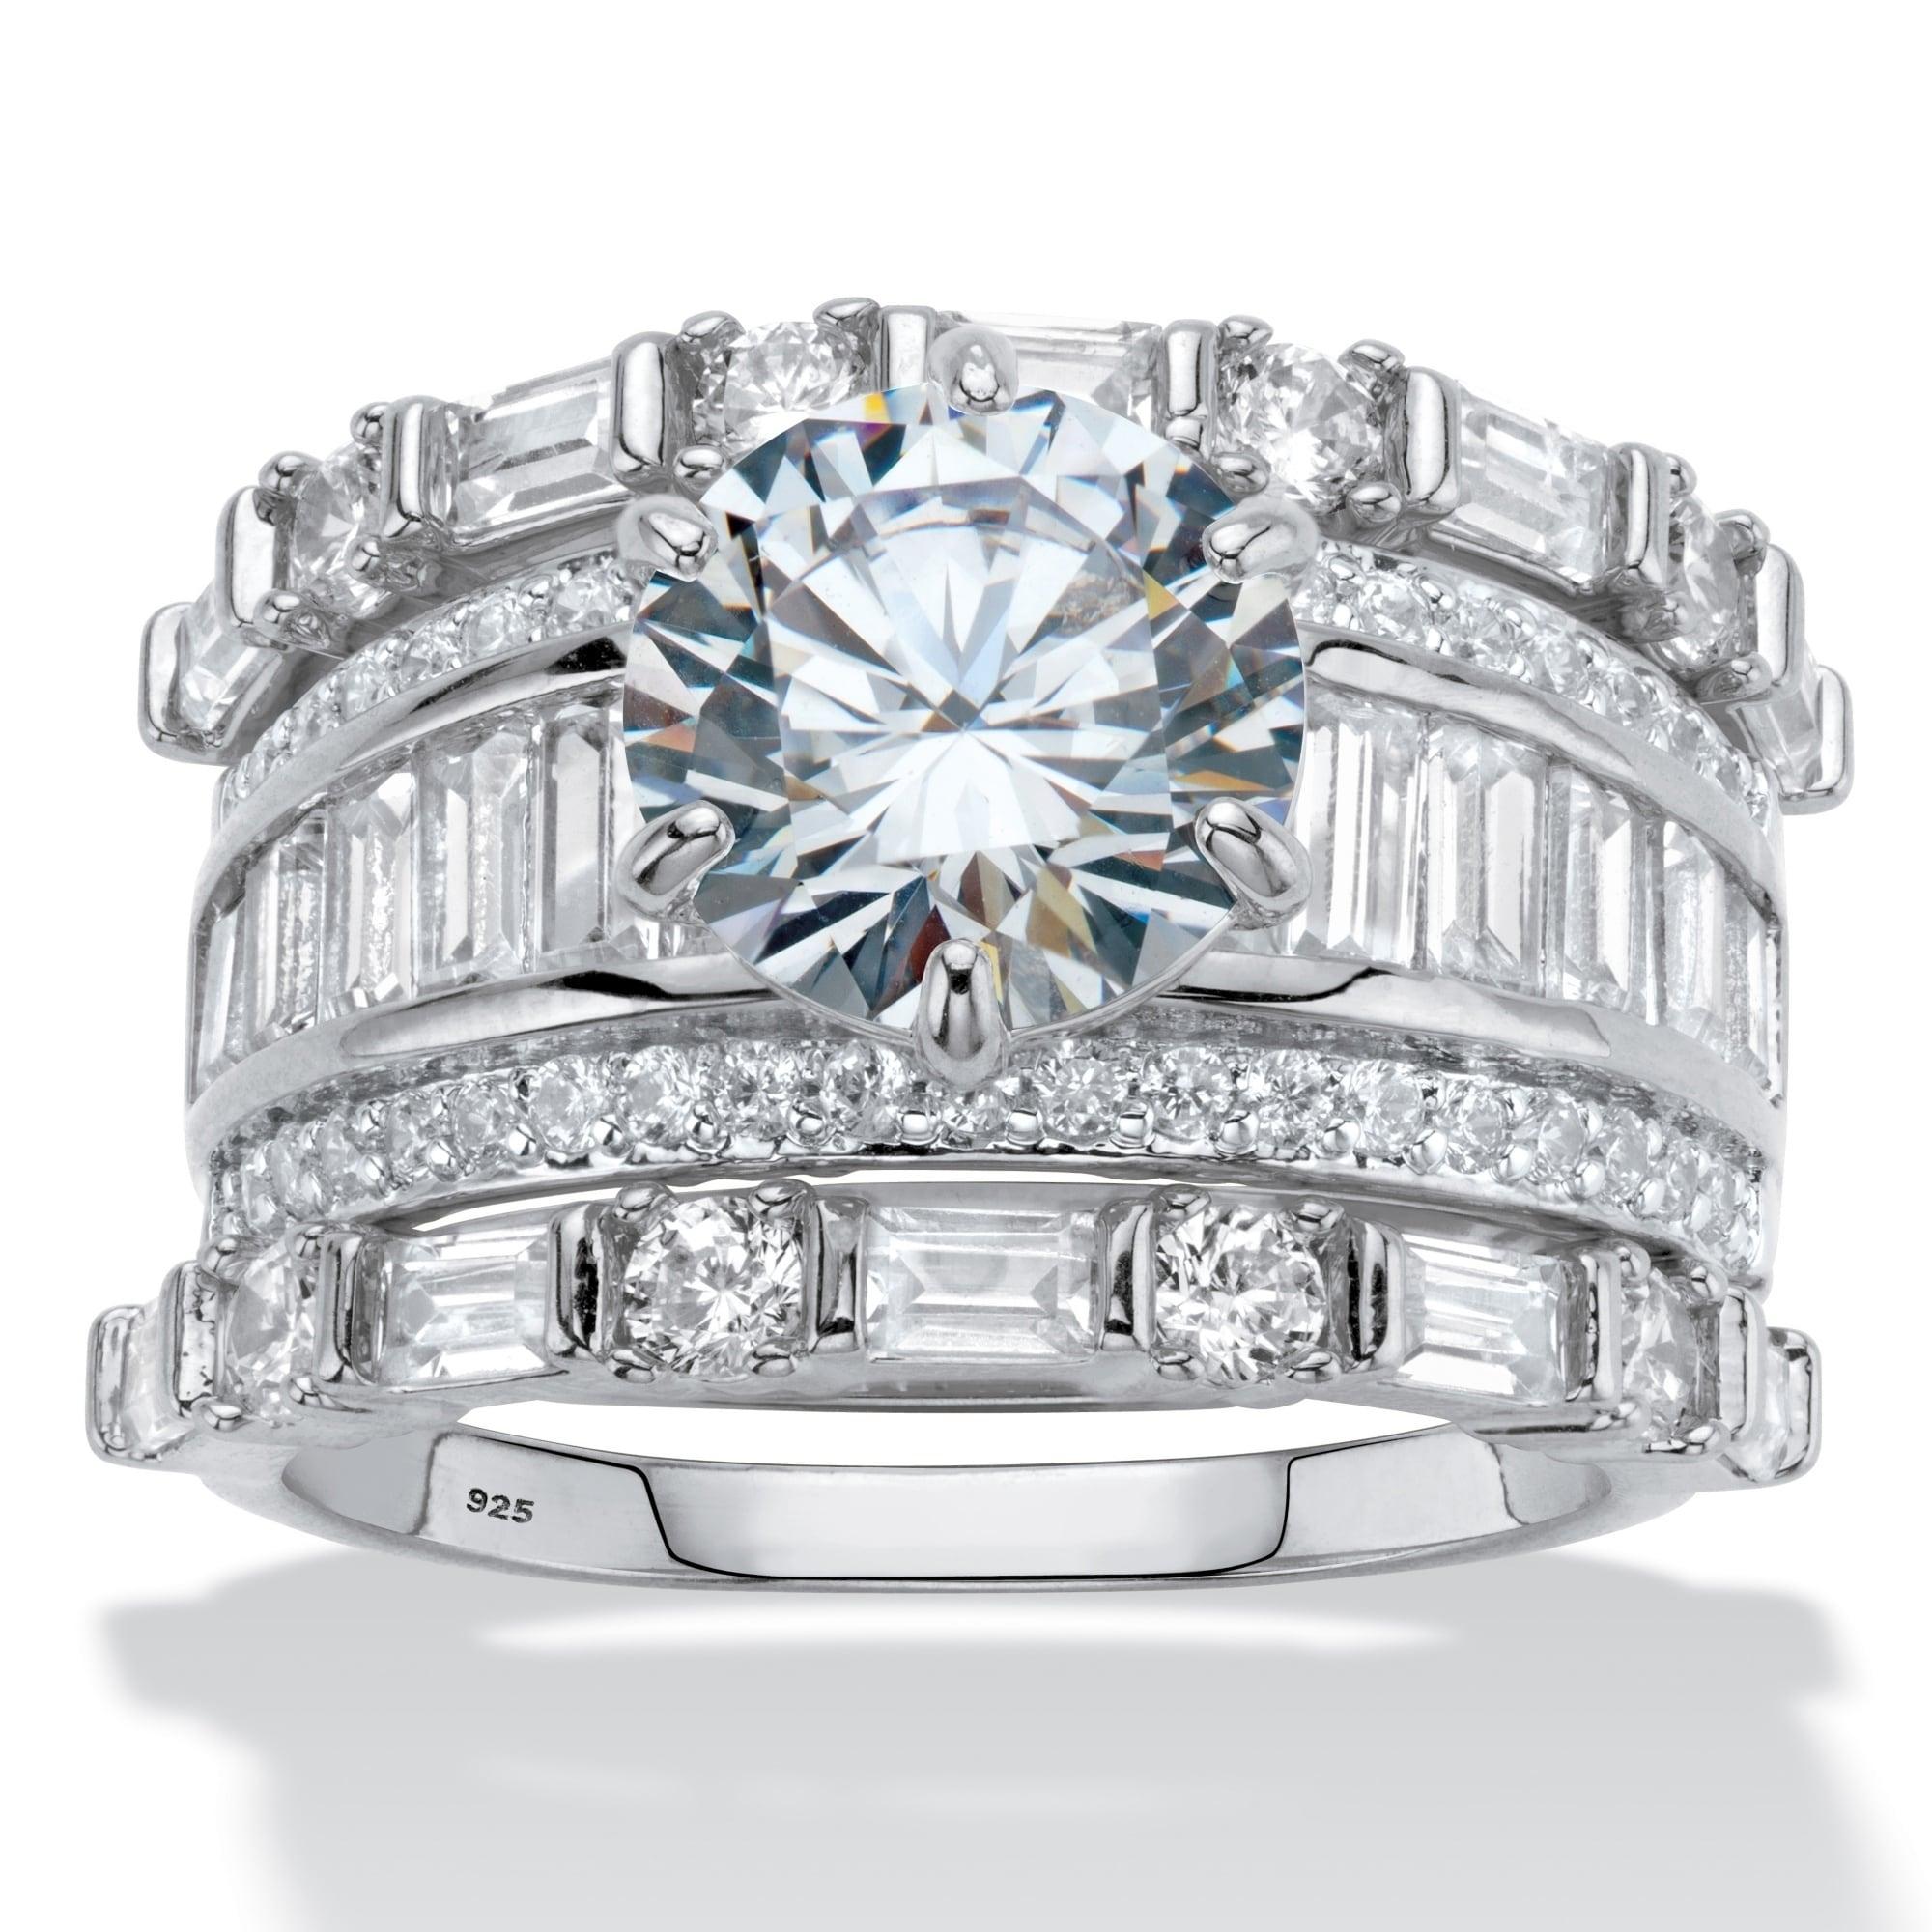 White Cubic Zirconia Band Silver Rings Set Women/'s Wedding Jewelry Sz 6-10